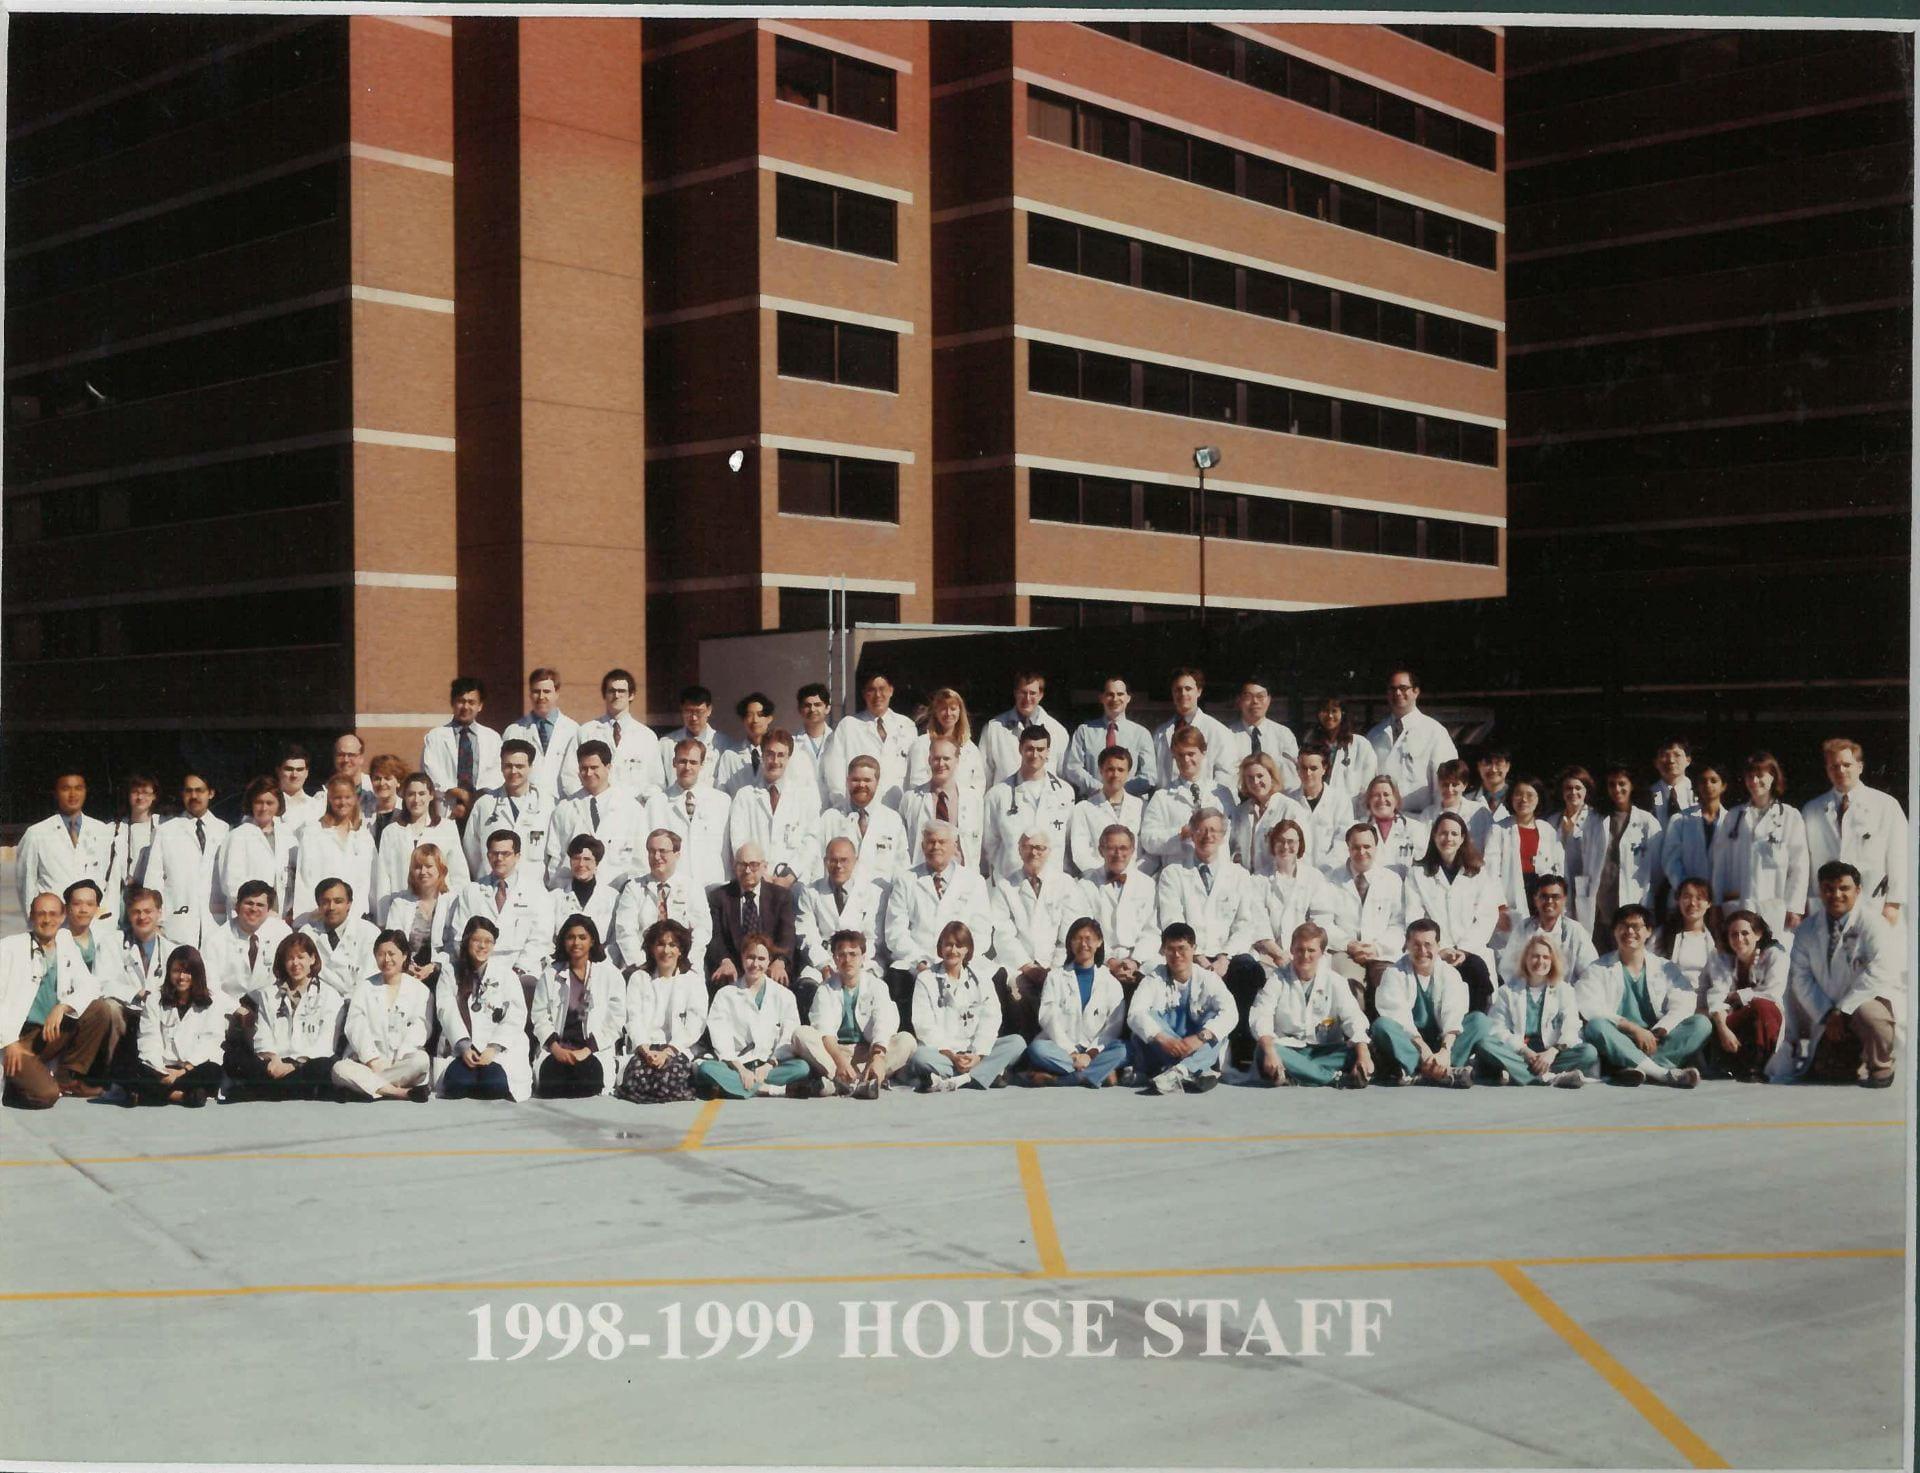 1998 Housestaff Photo